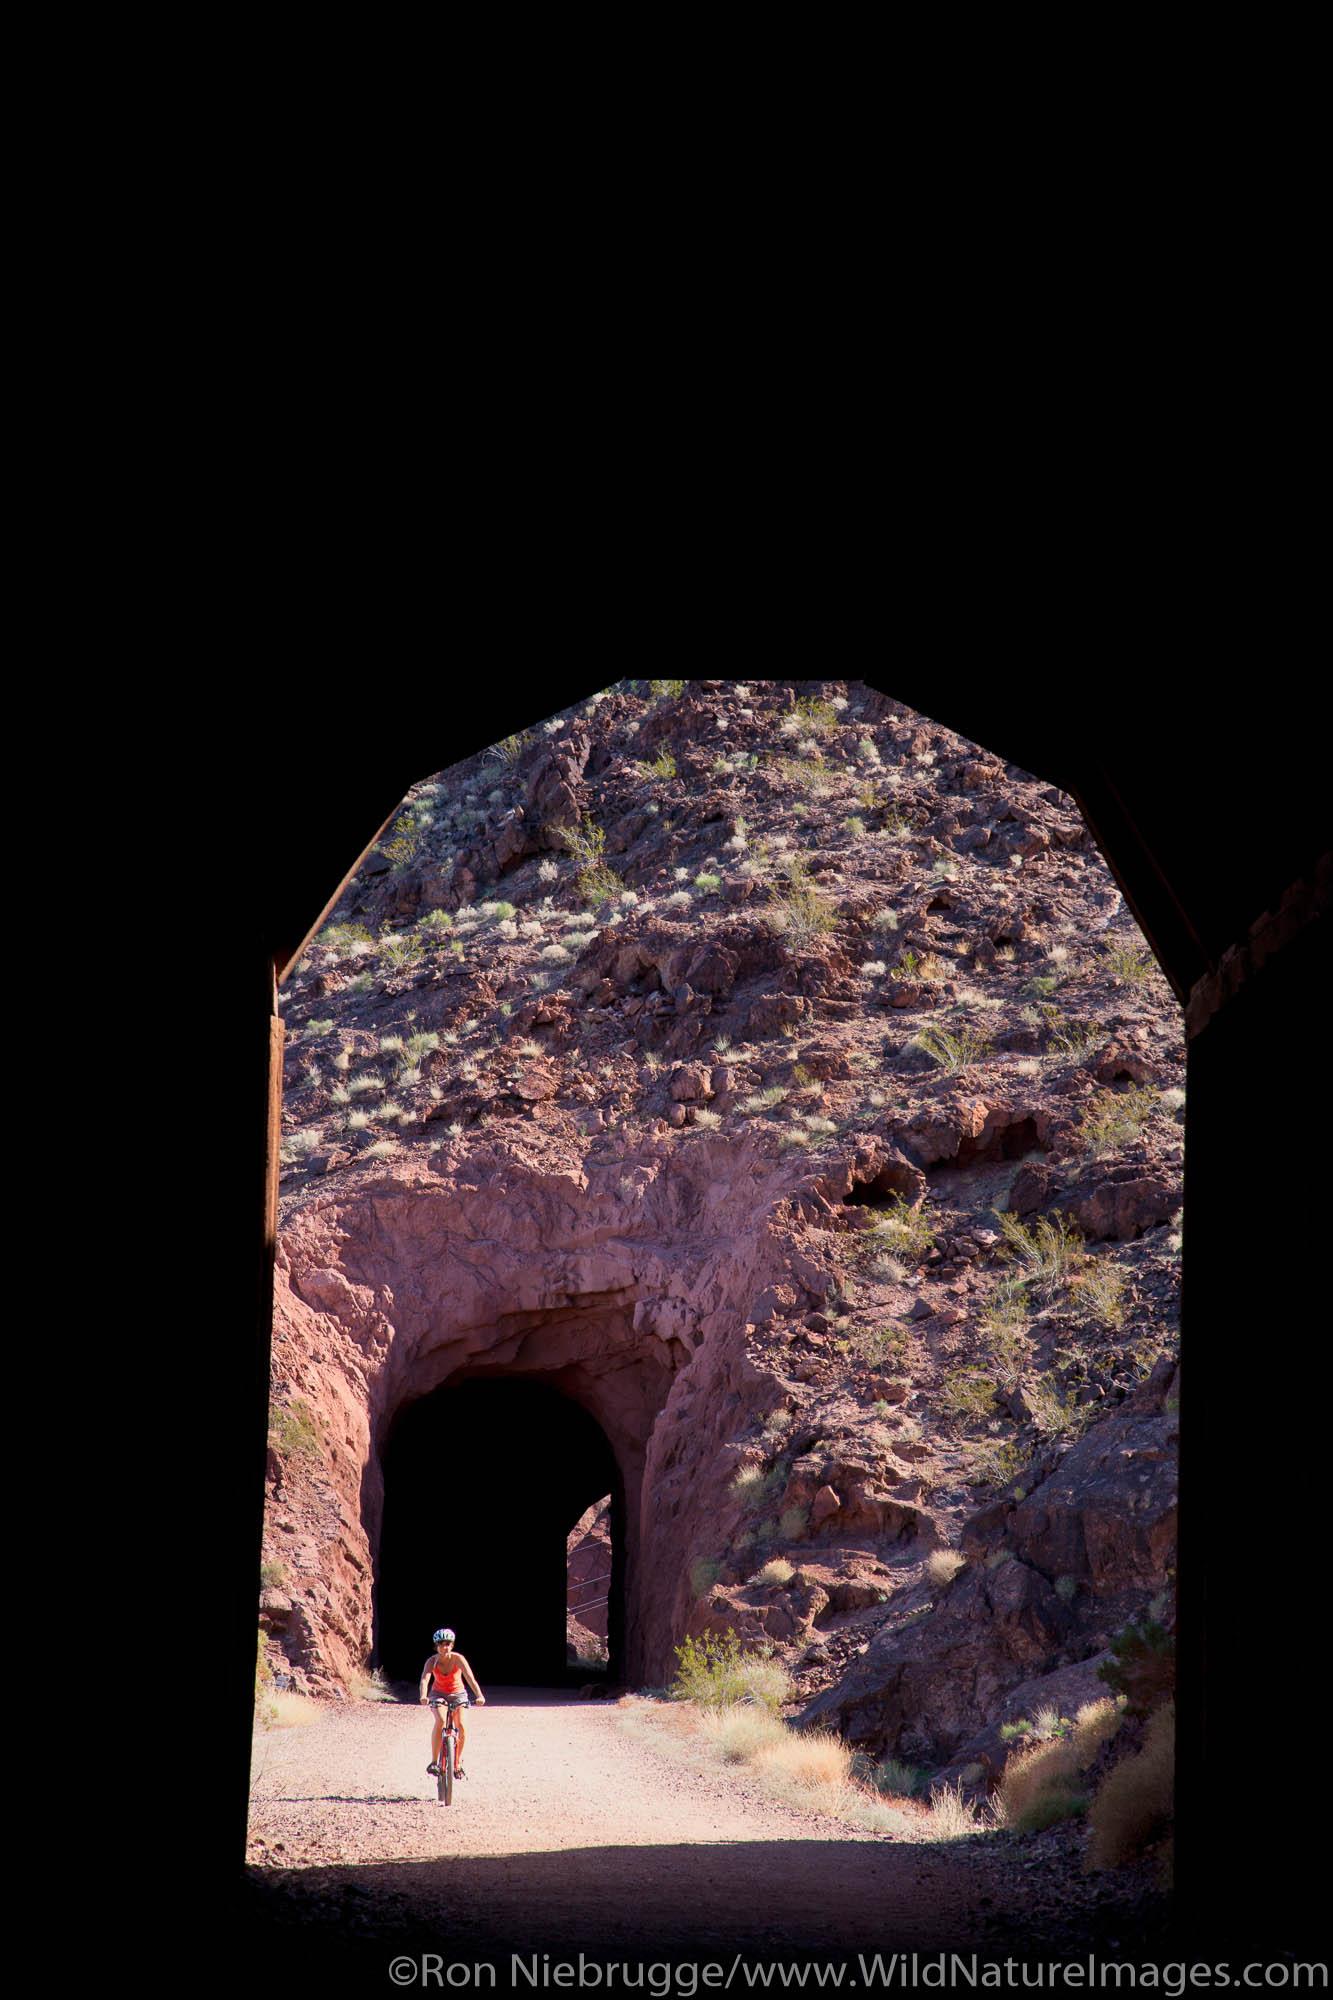 Biking  the  Railroad Tunnel Trail, Lake Mead National Recreation Area, Nevada (model released)